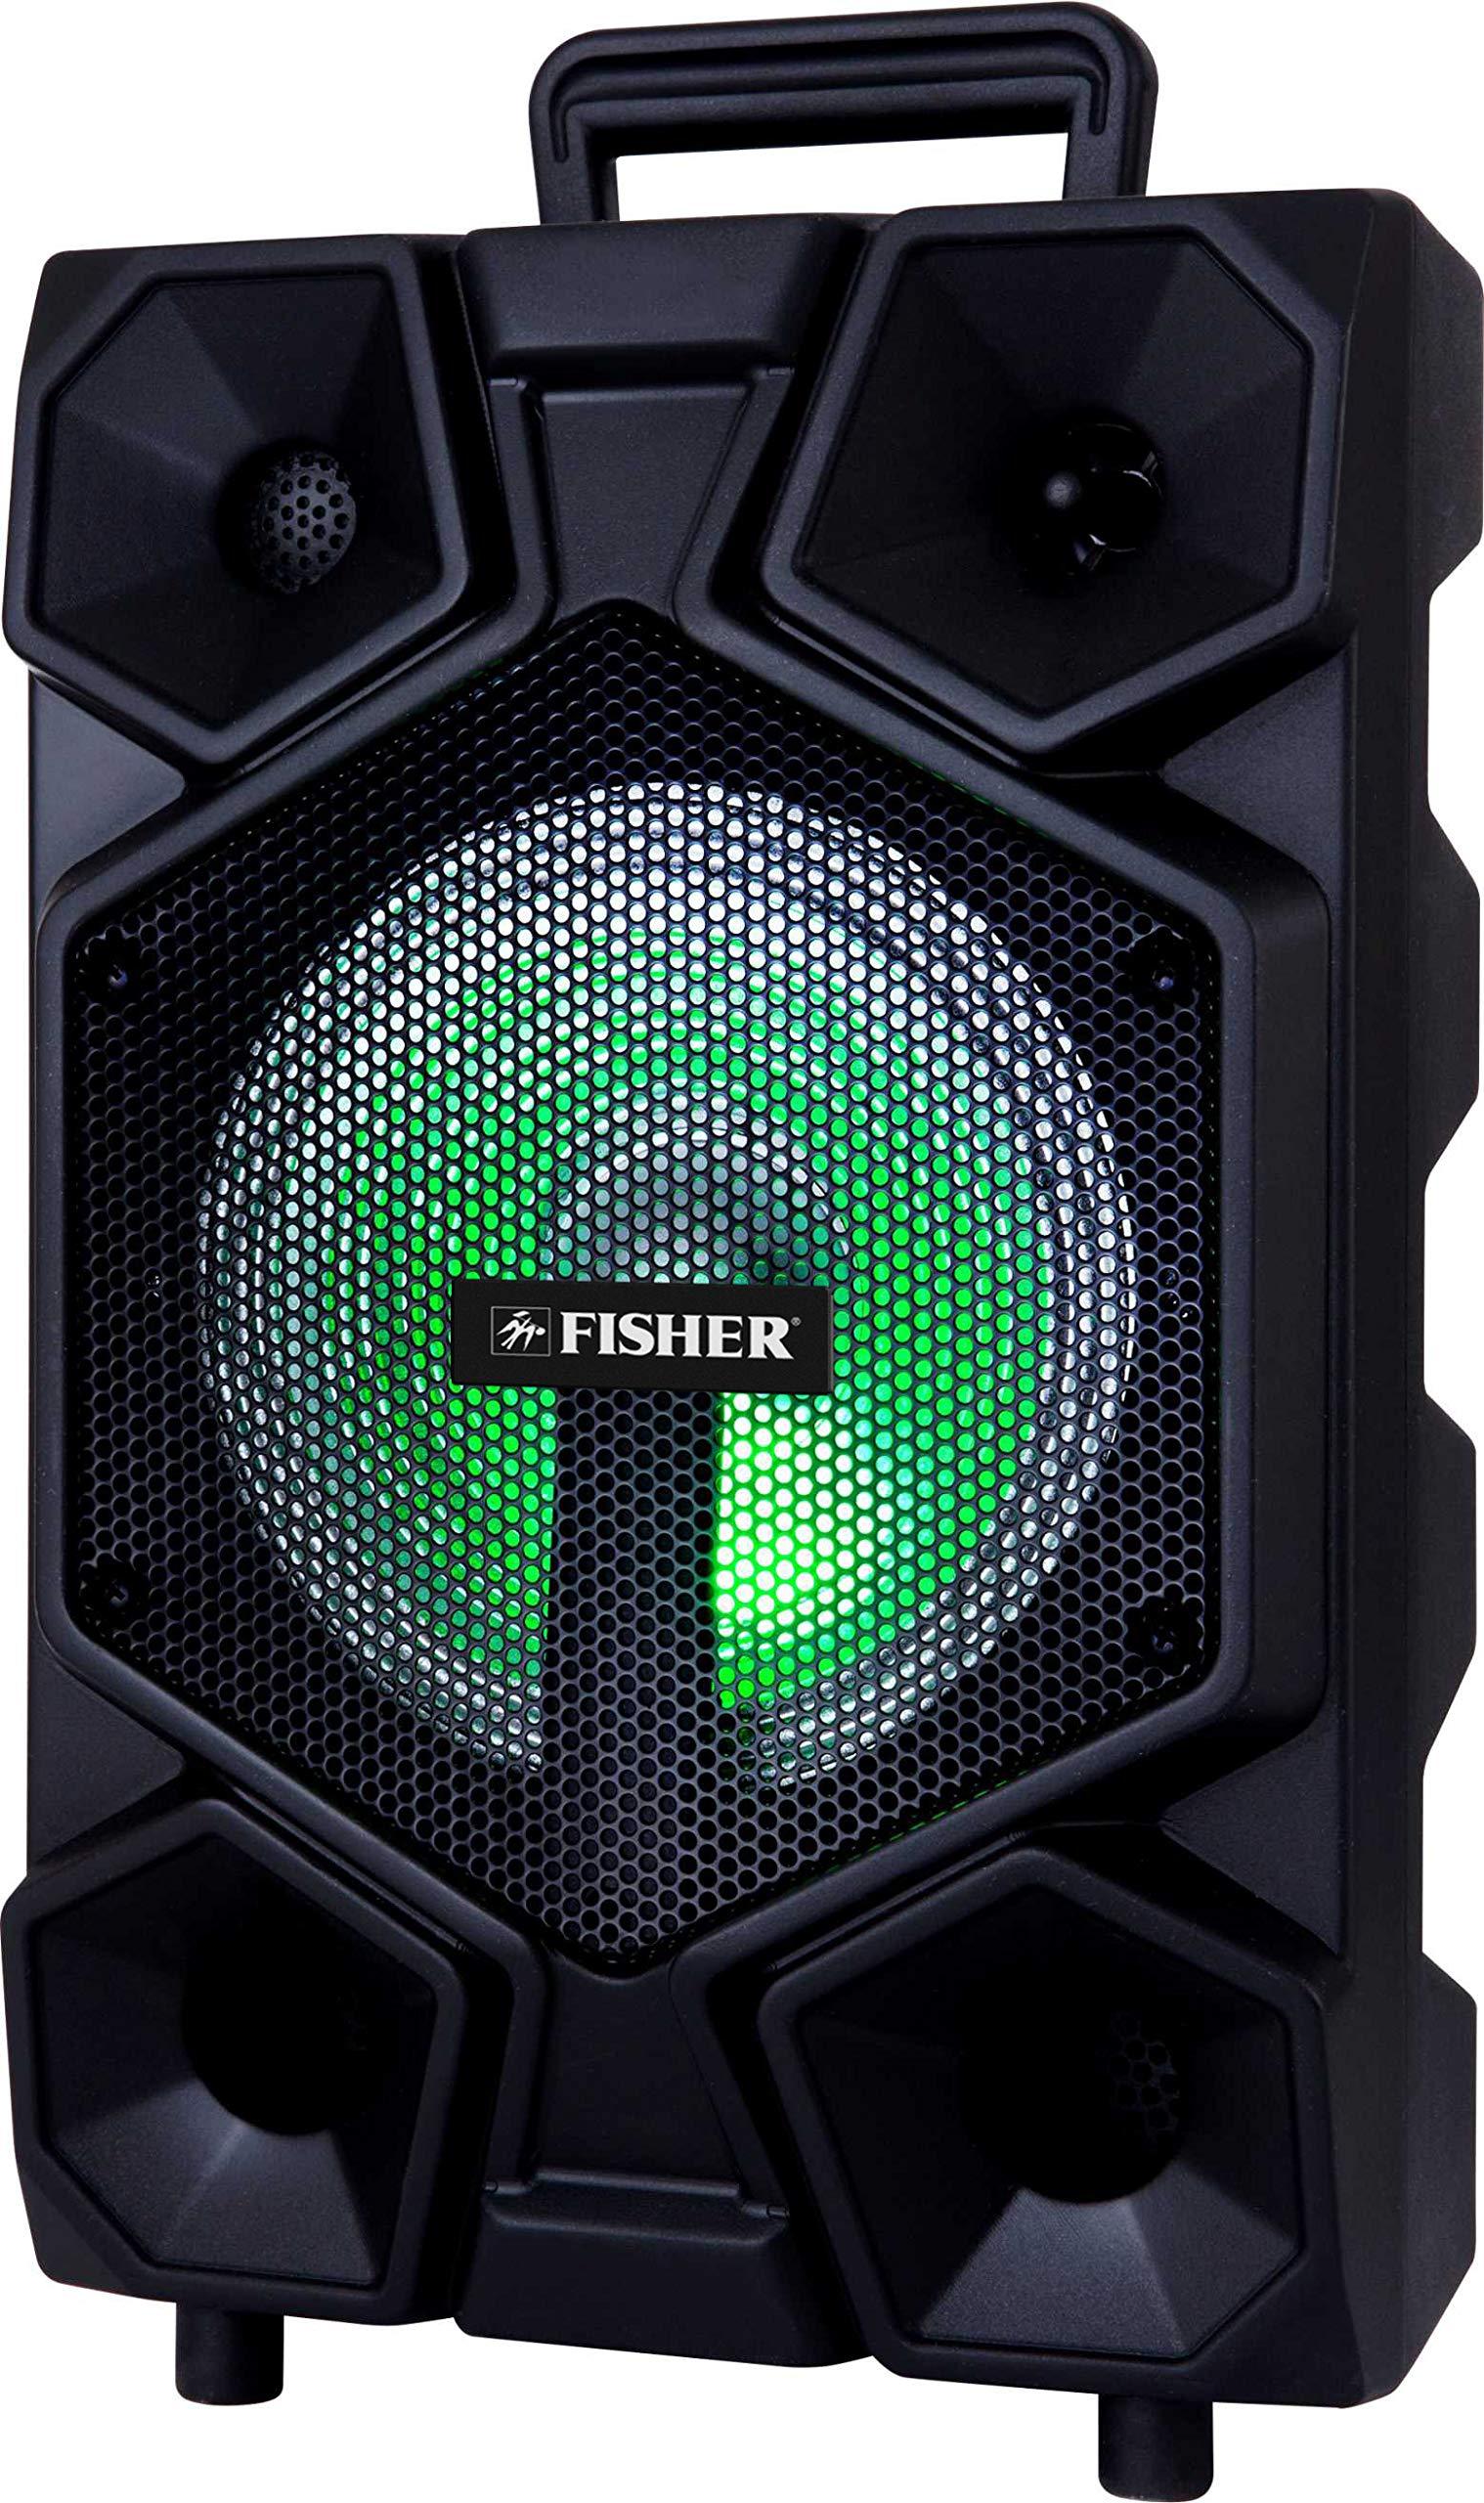 Fisher FBX860 Bluetooth Karaoke Speaker System w/Remote Control and Lights